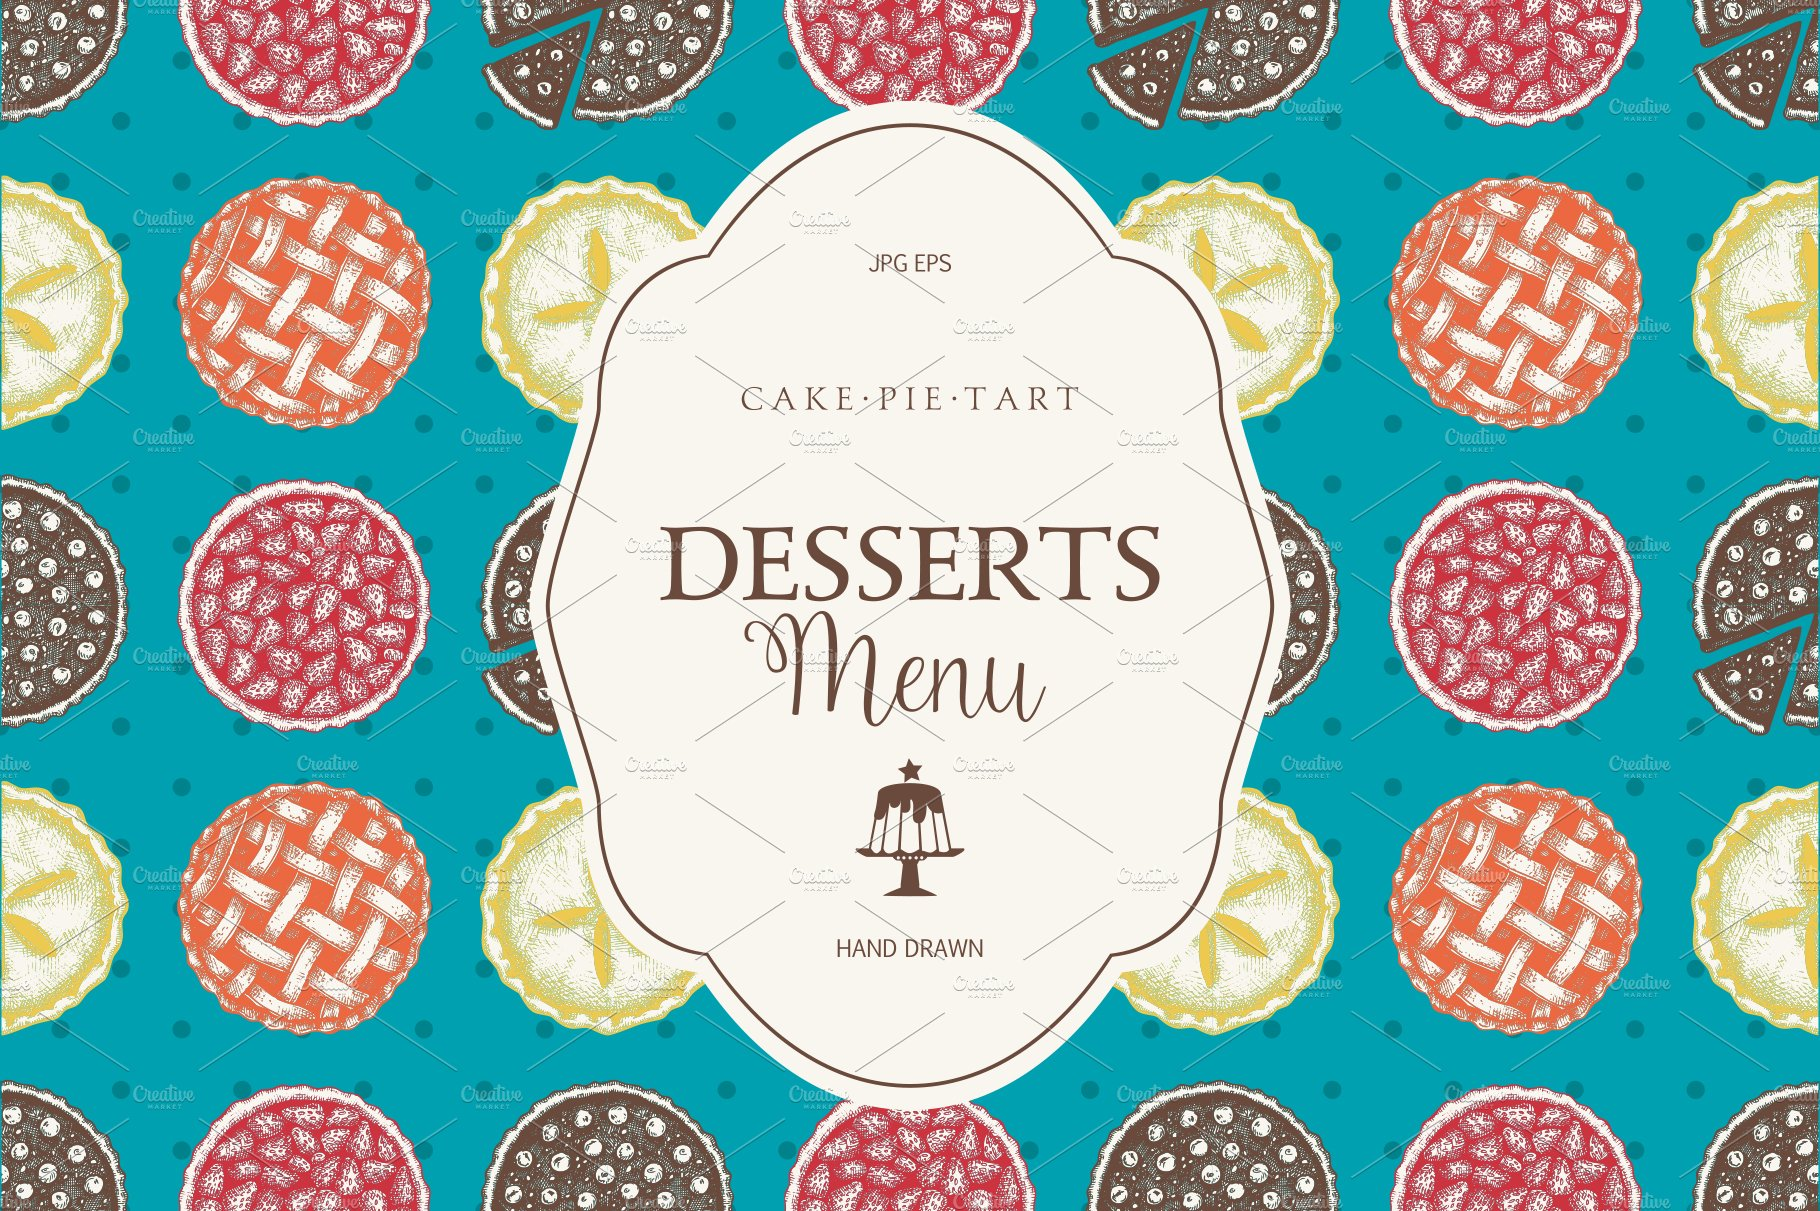 Sweet Bakery Menu Designs ~ Illustrations ~ Creative Market